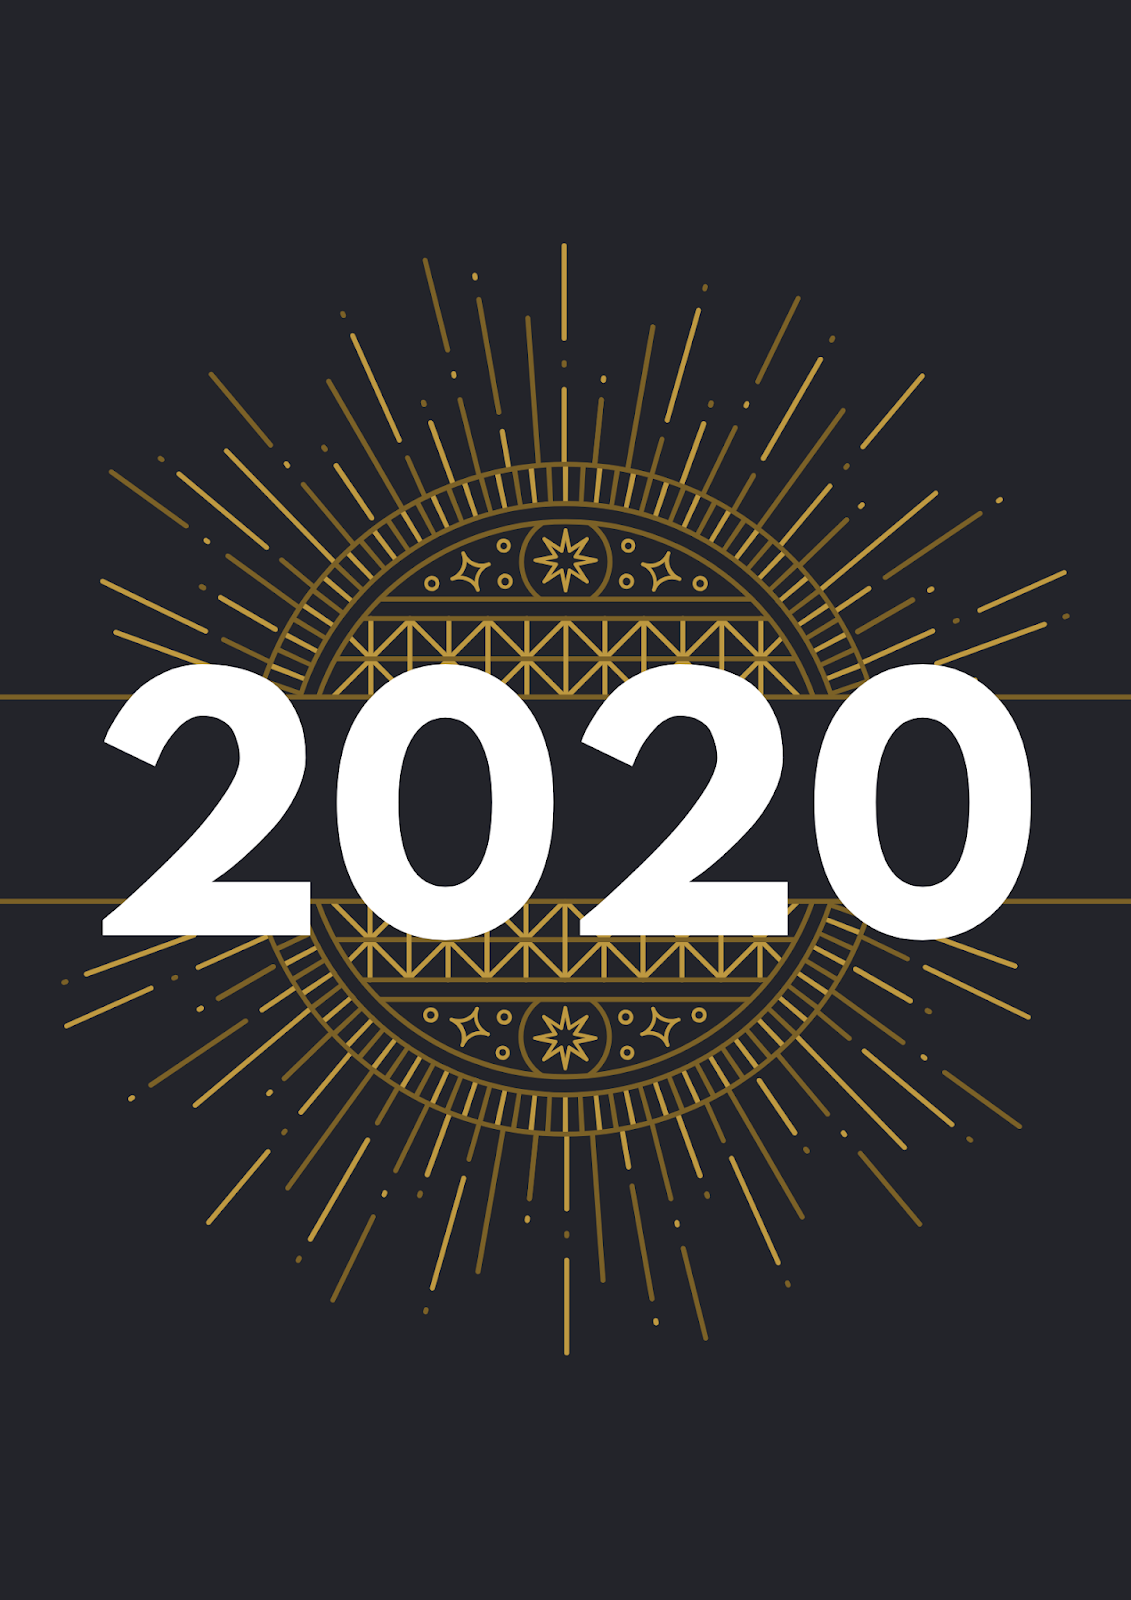 2020-black-photo